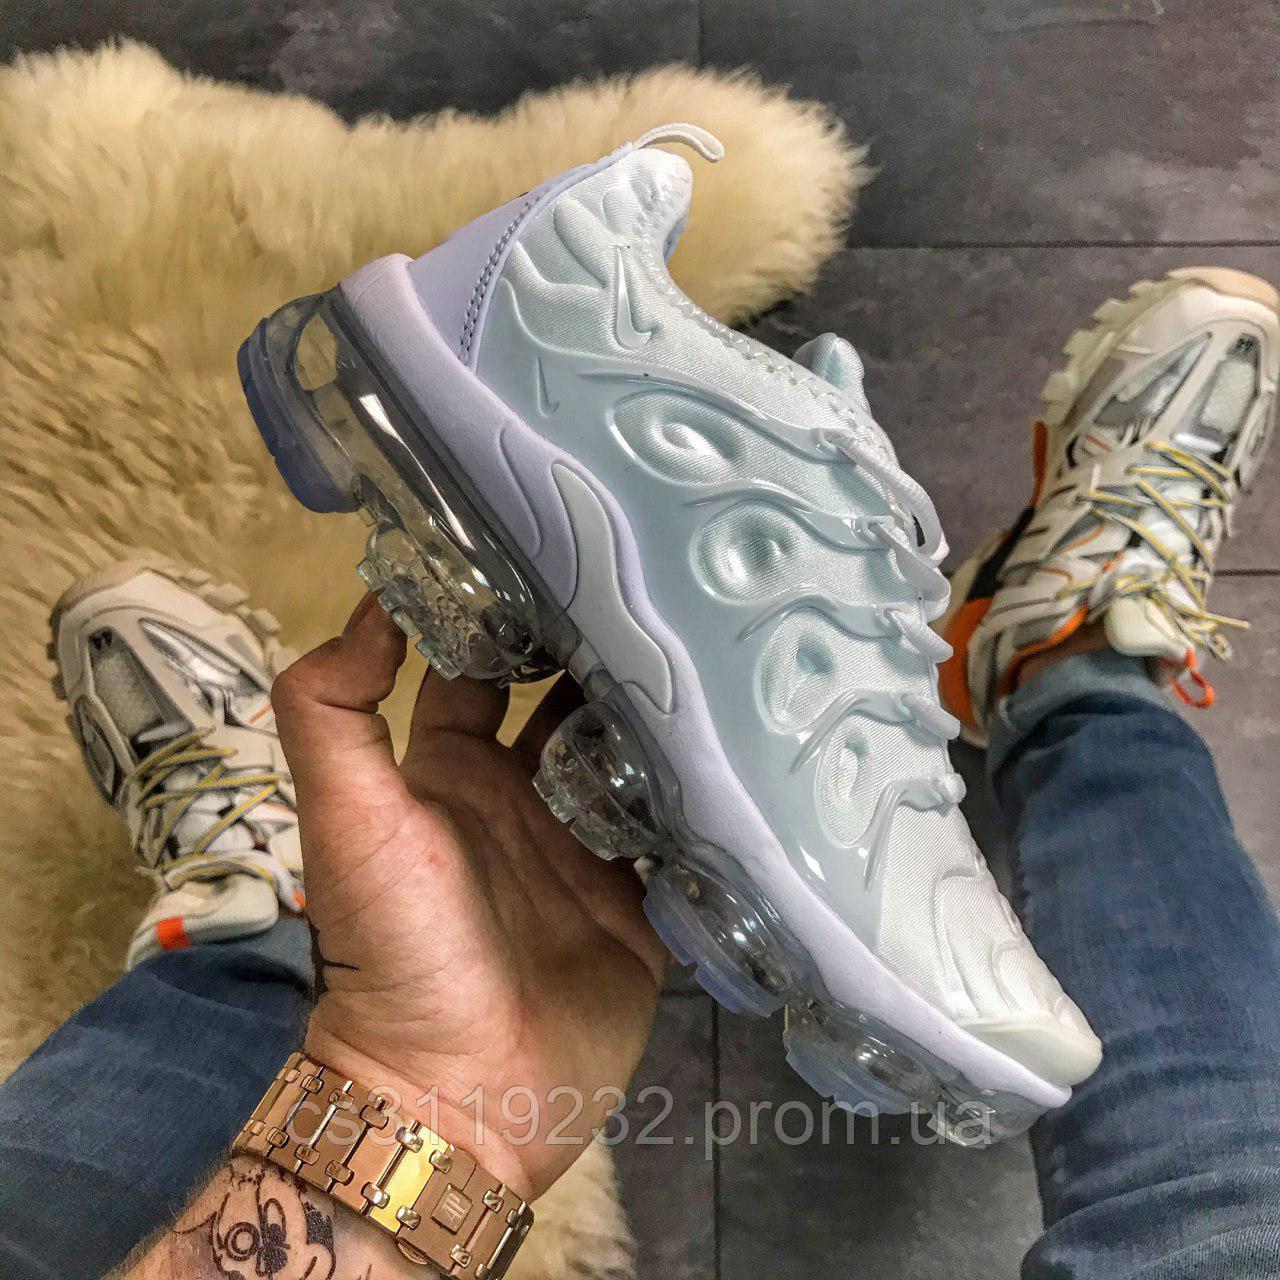 Мужские кроссовки Nike VaporMax Plus Triple White (белый)